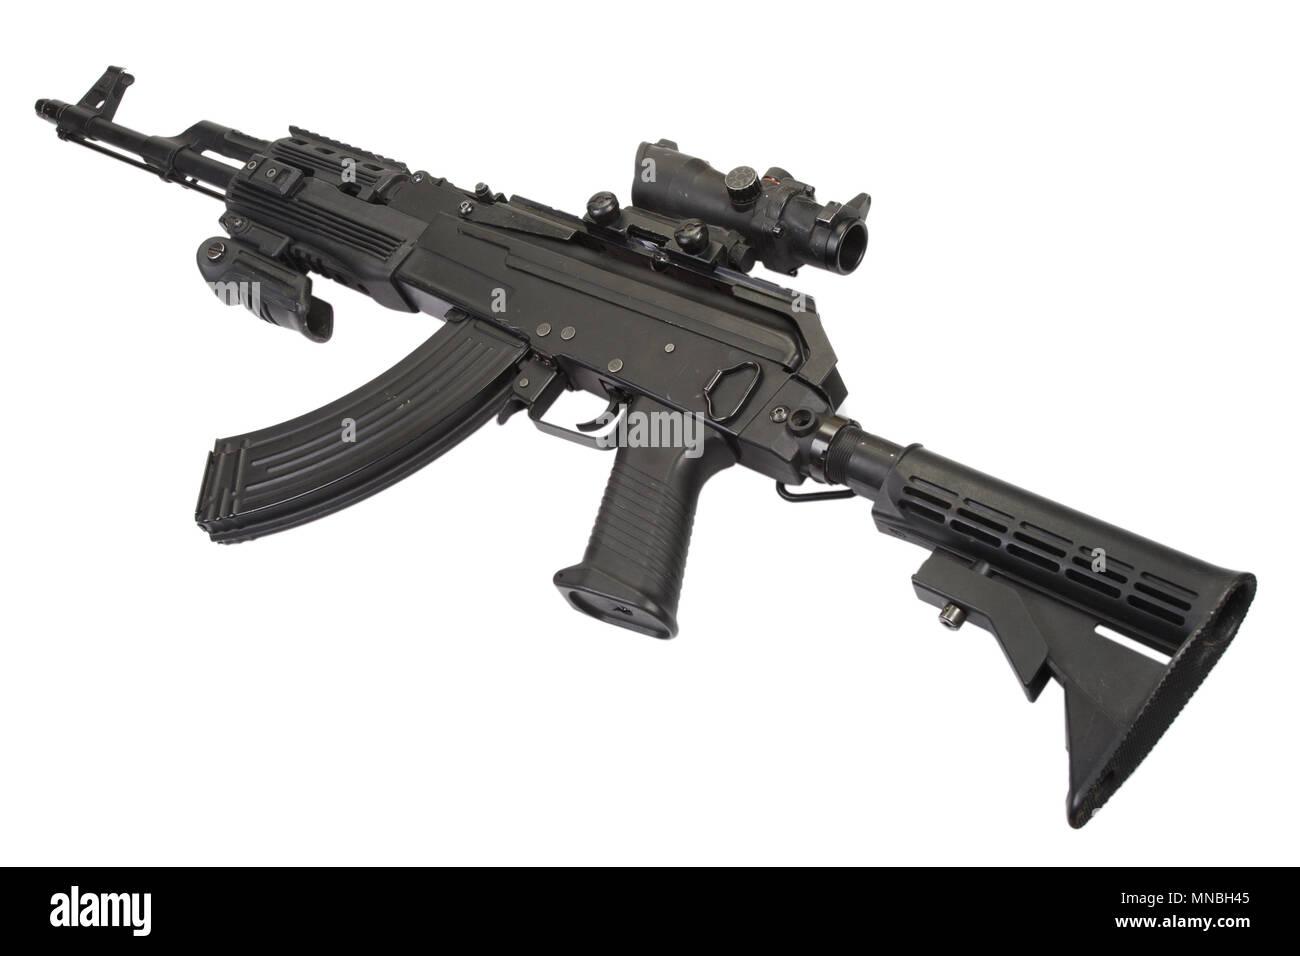 Modern Kalashnikov AK47 with tactical accessories Stock